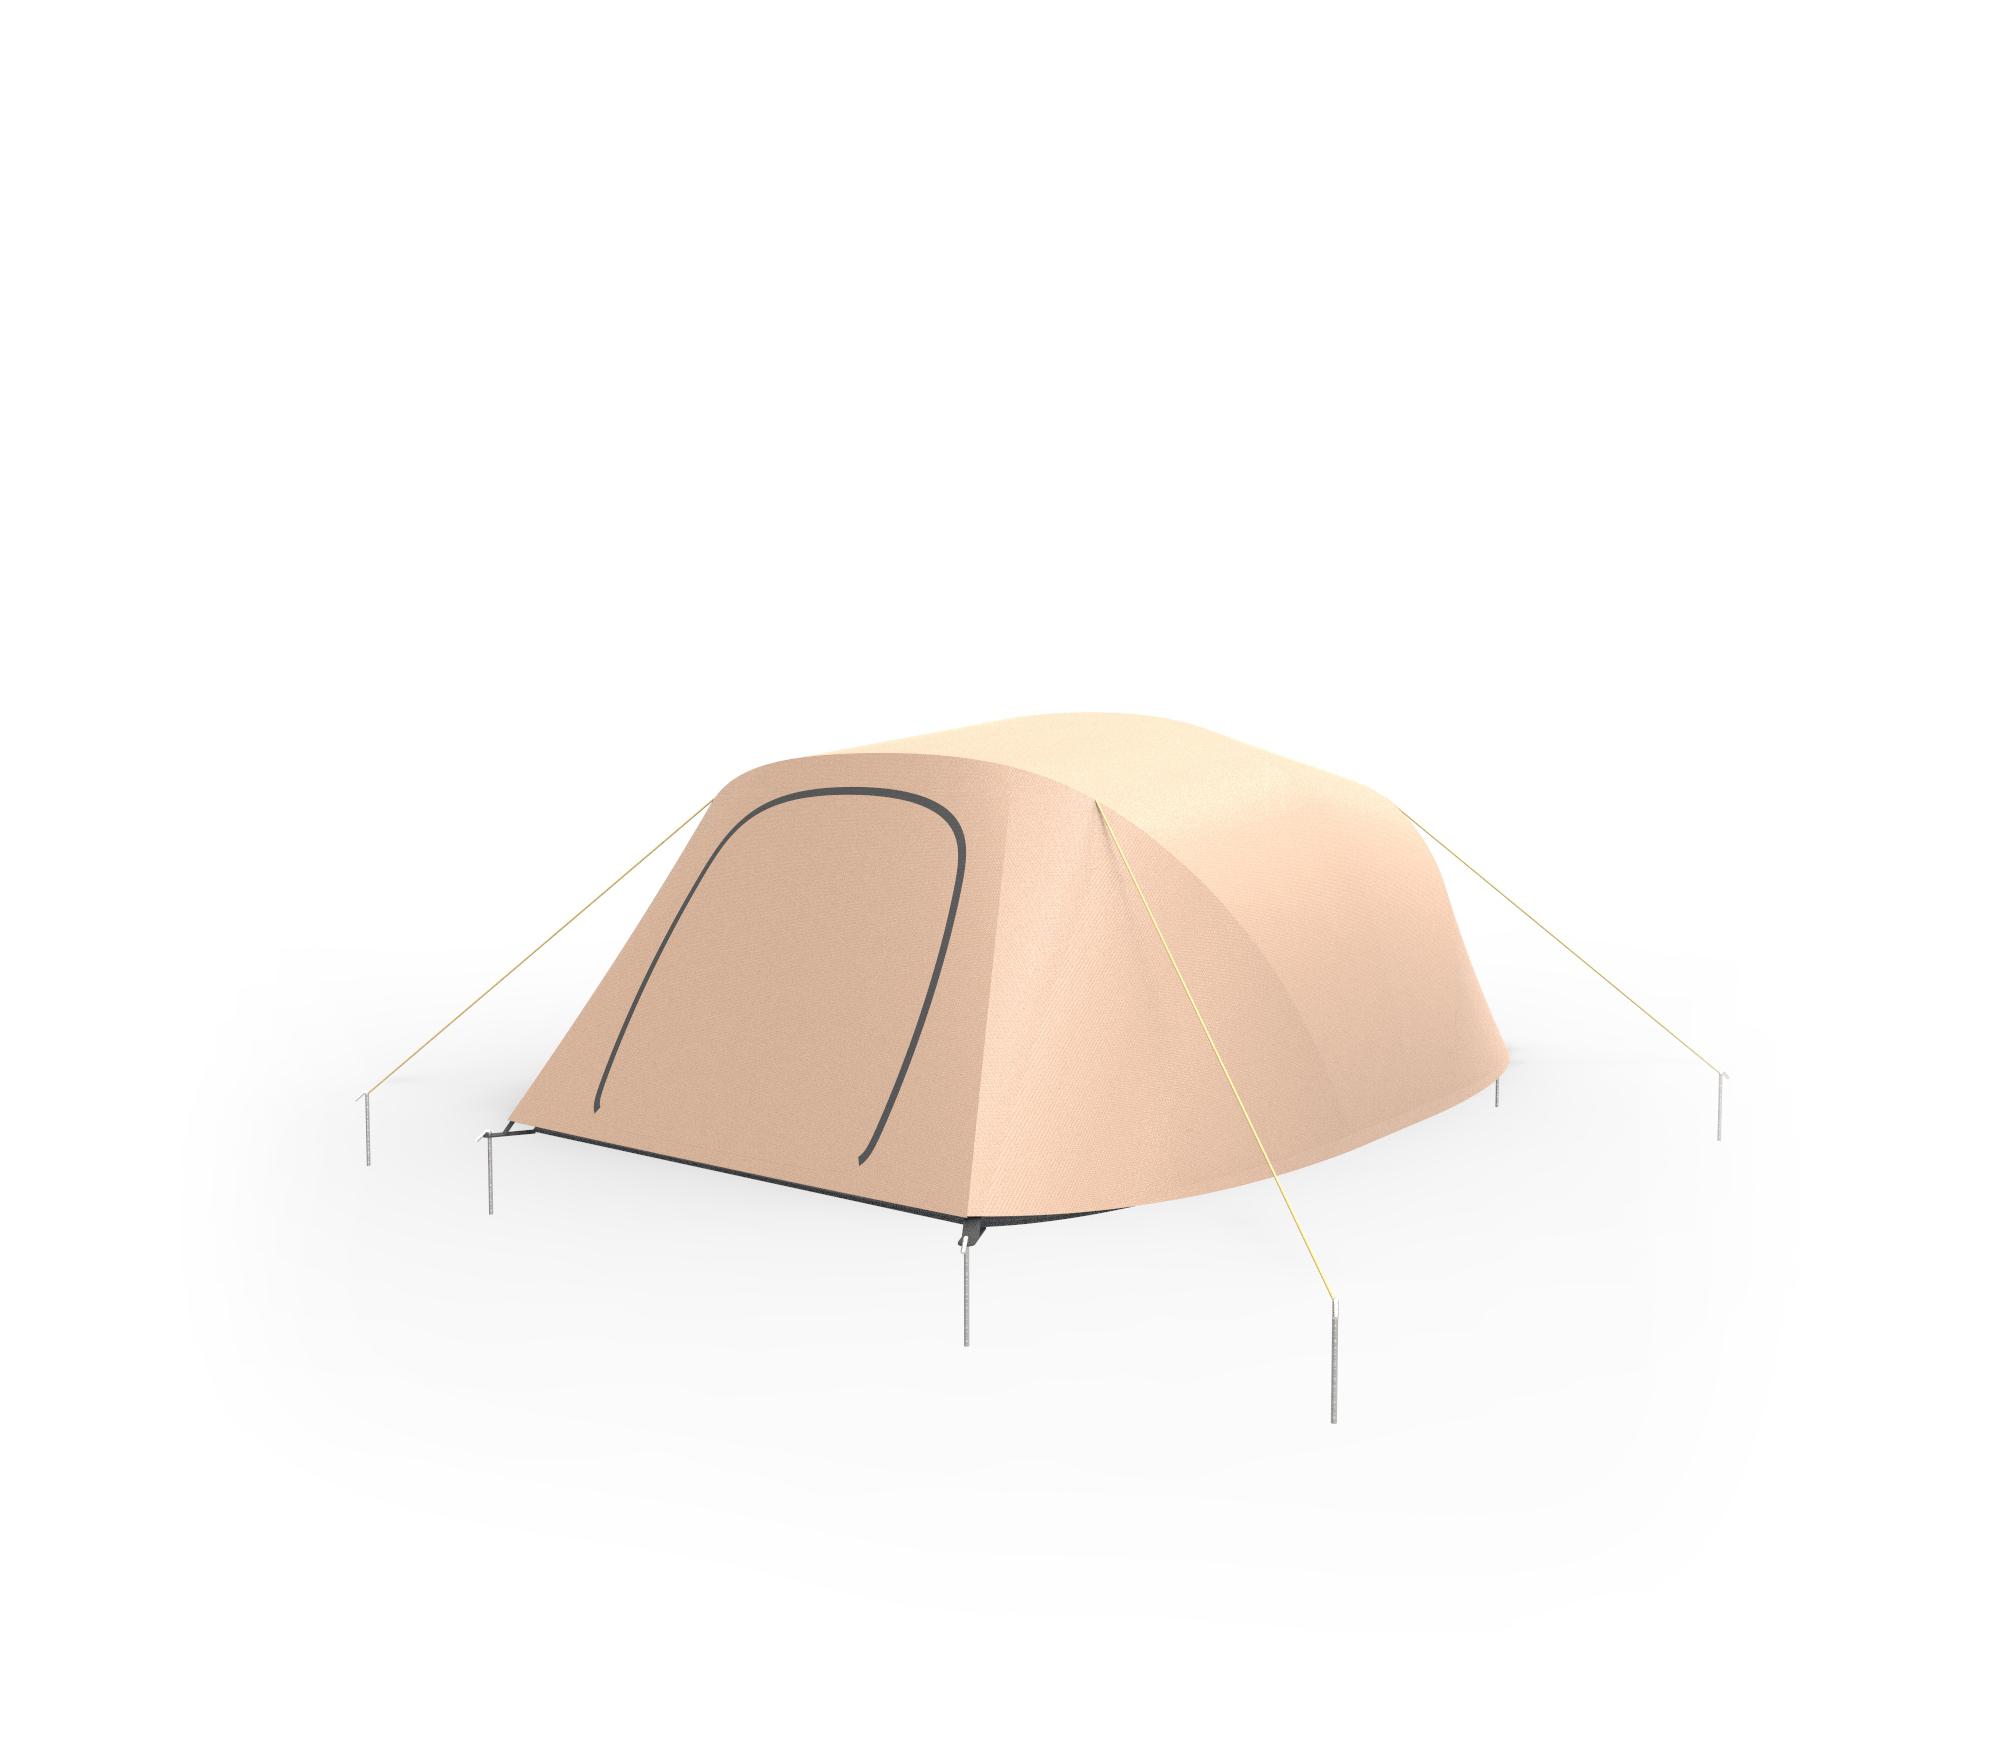 tents.12.jpg